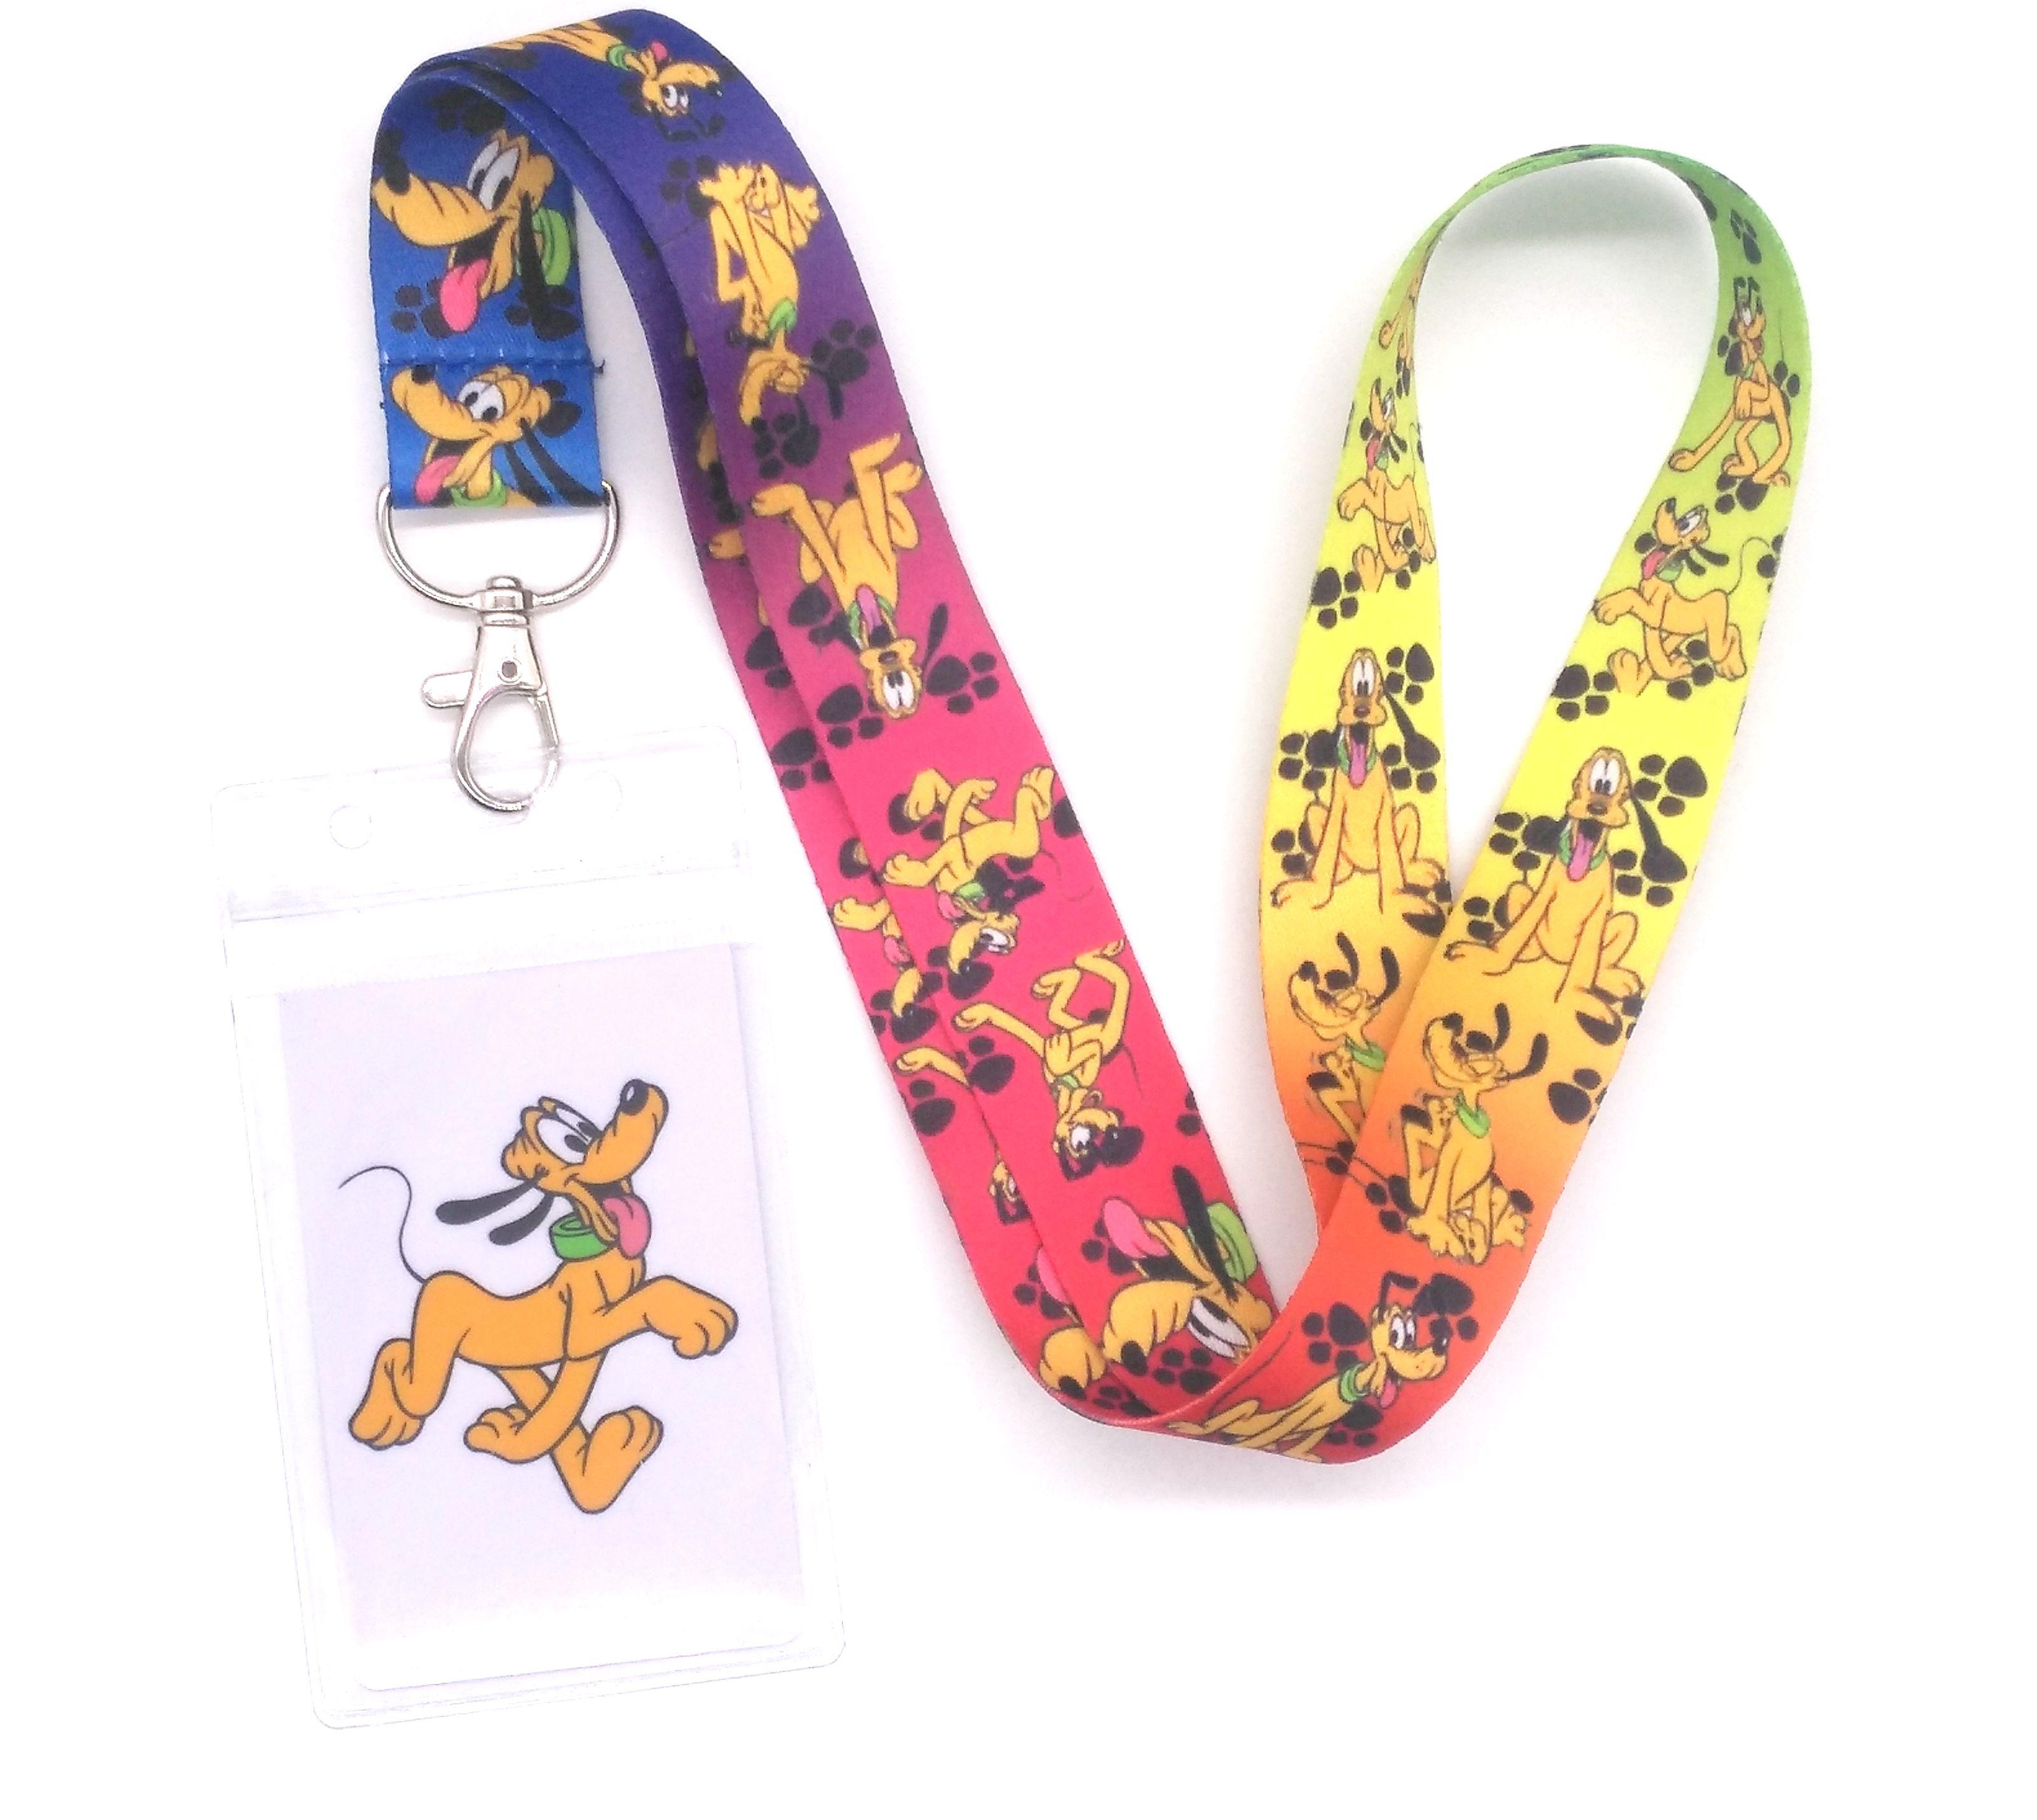 Hot 1 Pcs Cartoon Pluto Dog  Lanyard Key Lanyard Cosplay Badge ID Cards Holders Neck Straps Keyrchains